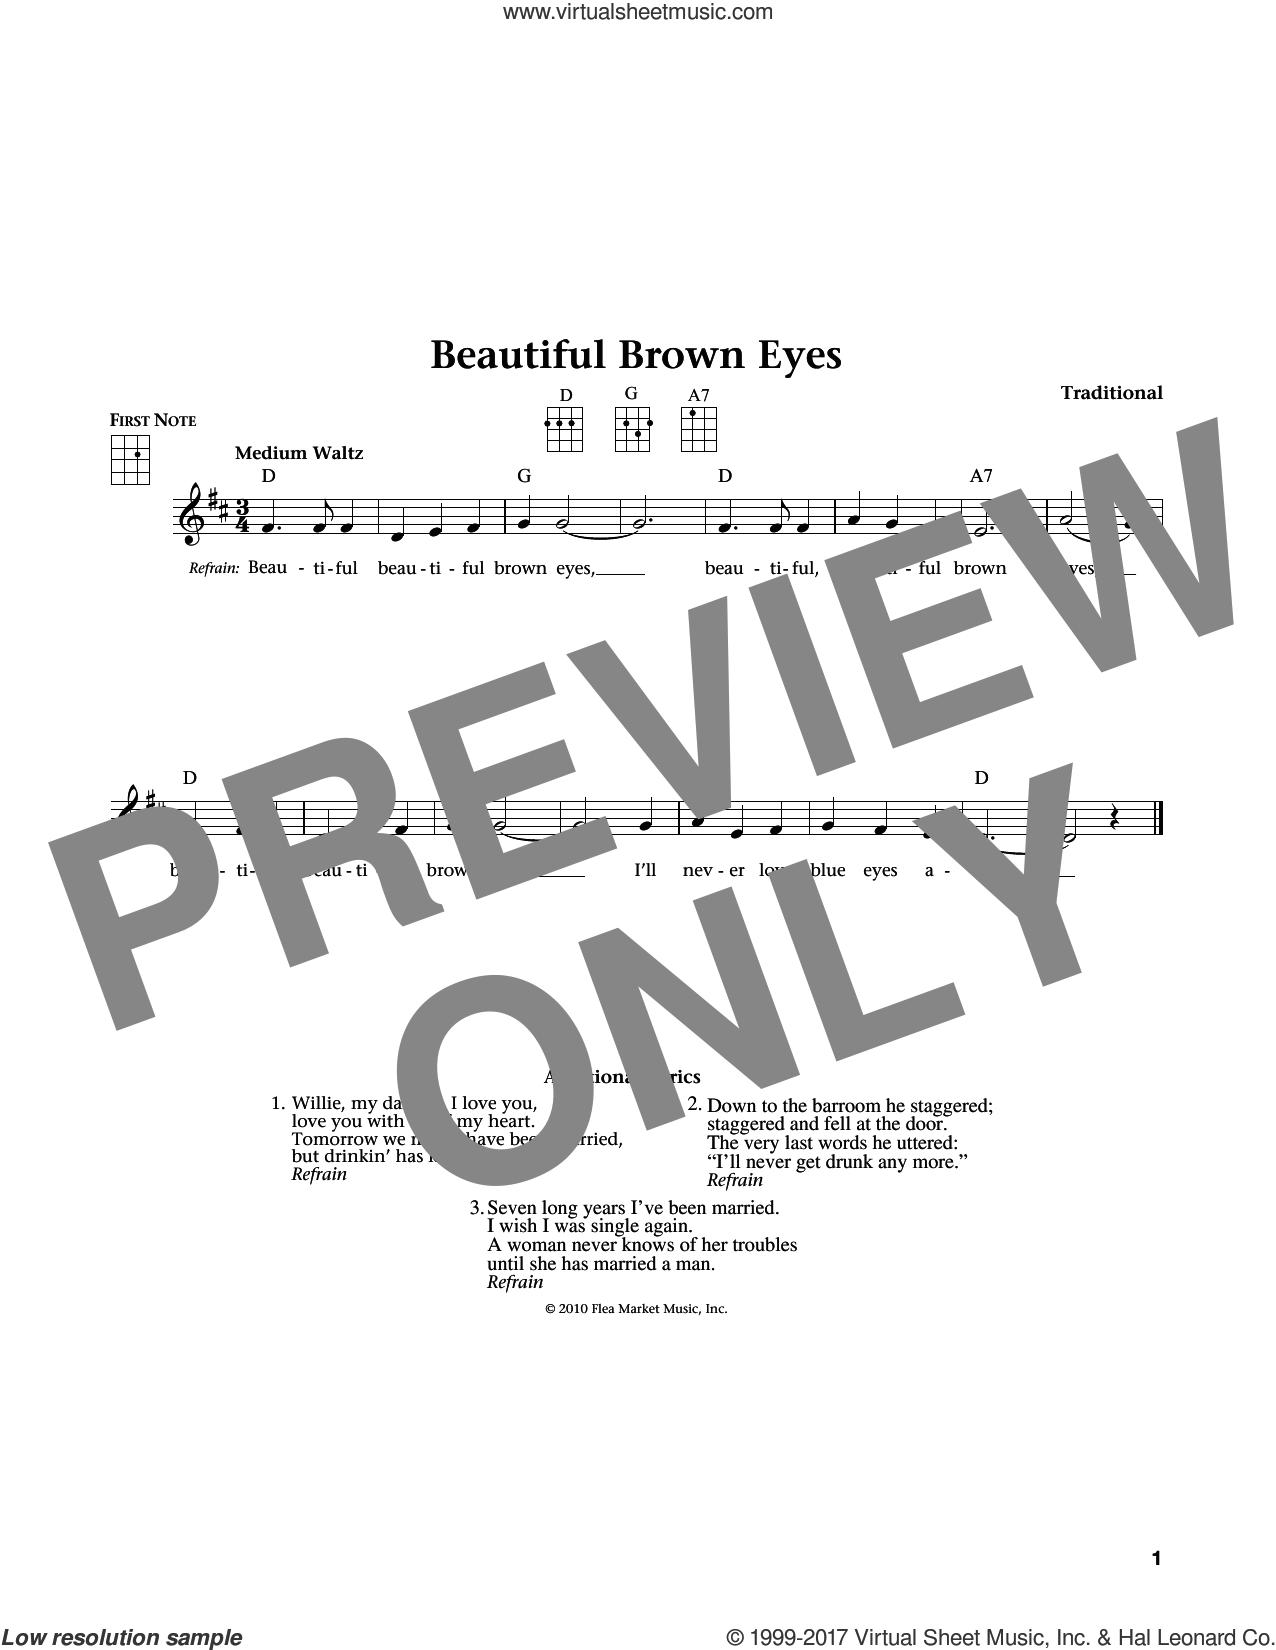 Beautiful Brown Eyes (from The Daily Ukulele) (arr. Liz and Jim Beloff) sheet music for ukulele , Jim Beloff and Liz Beloff, intermediate skill level